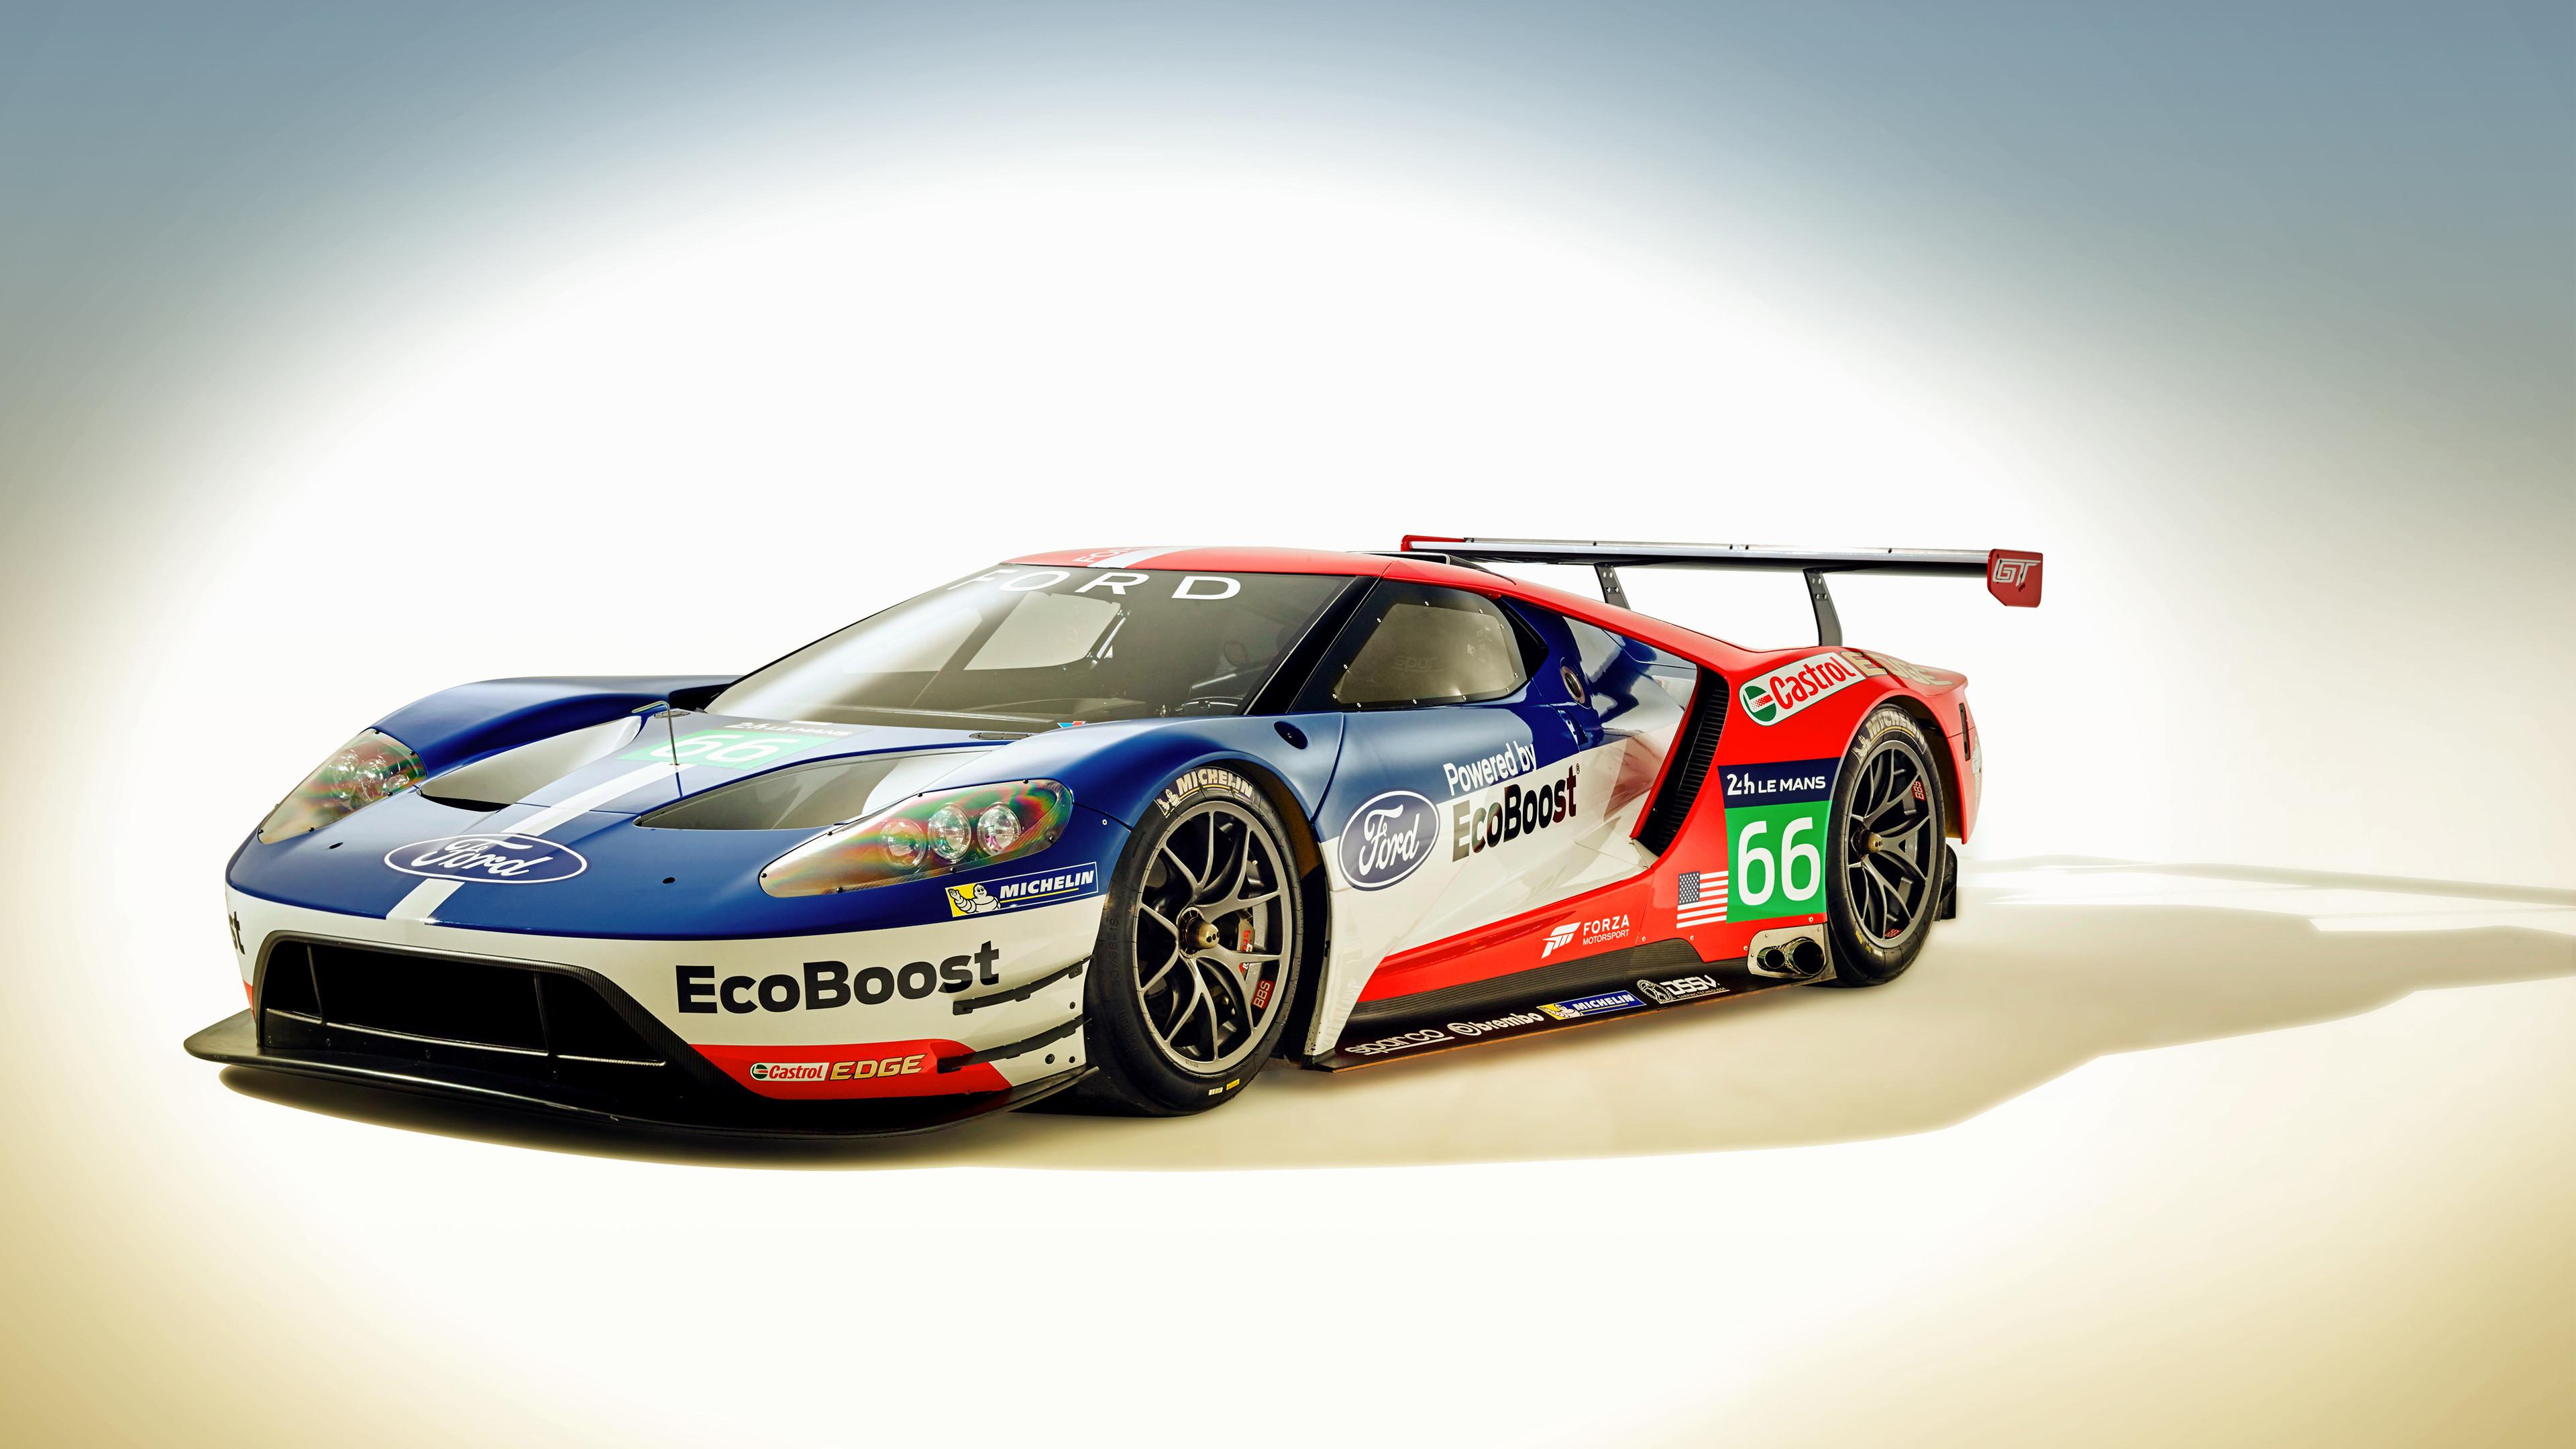 Ford Gt Sports Car Wallpaper Hd Desktop Tablet: HD Race Car Wallpaper (71+ Images